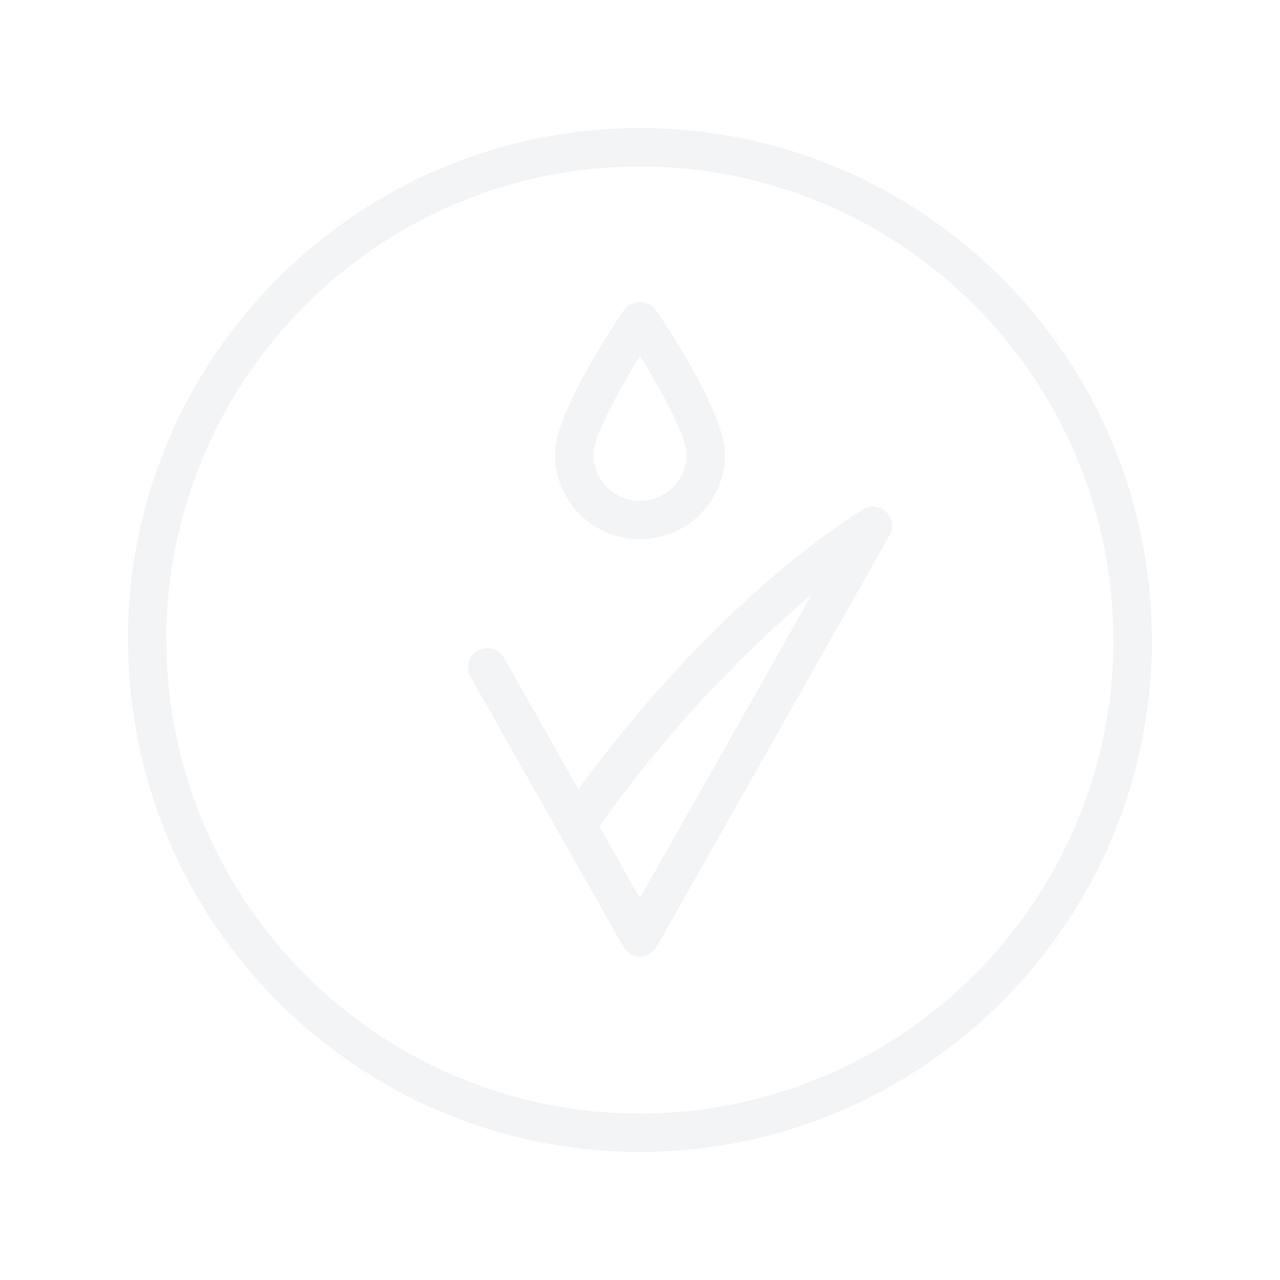 BOURJOIS Khol & Contour Eye Pencil 1.2g